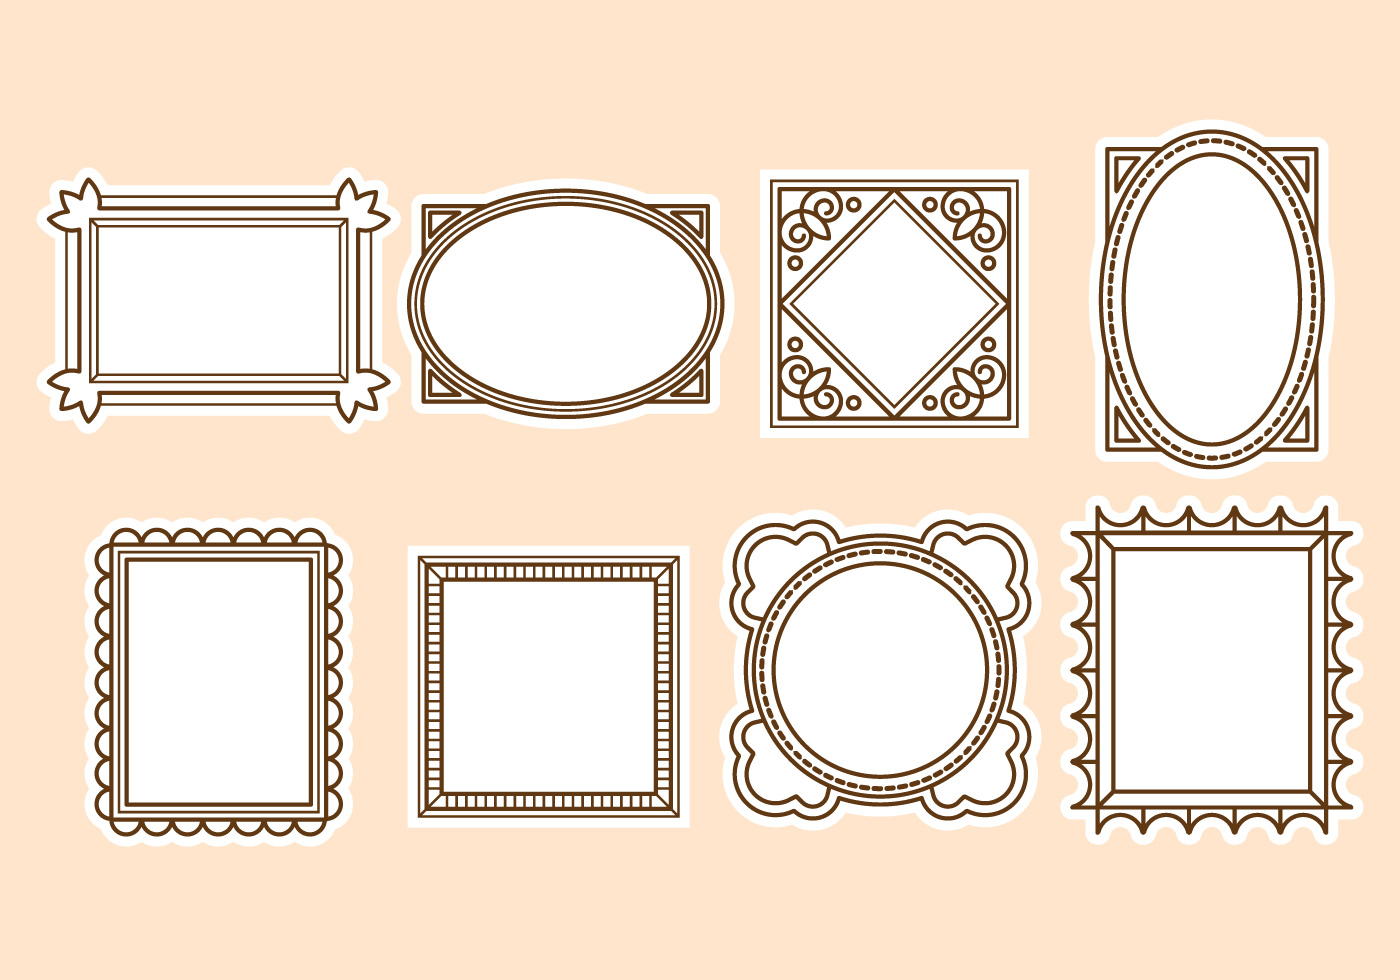 gro vintage rahmen vektor frei bilder benutzerdefinierte bilderrahmen ideen. Black Bedroom Furniture Sets. Home Design Ideas